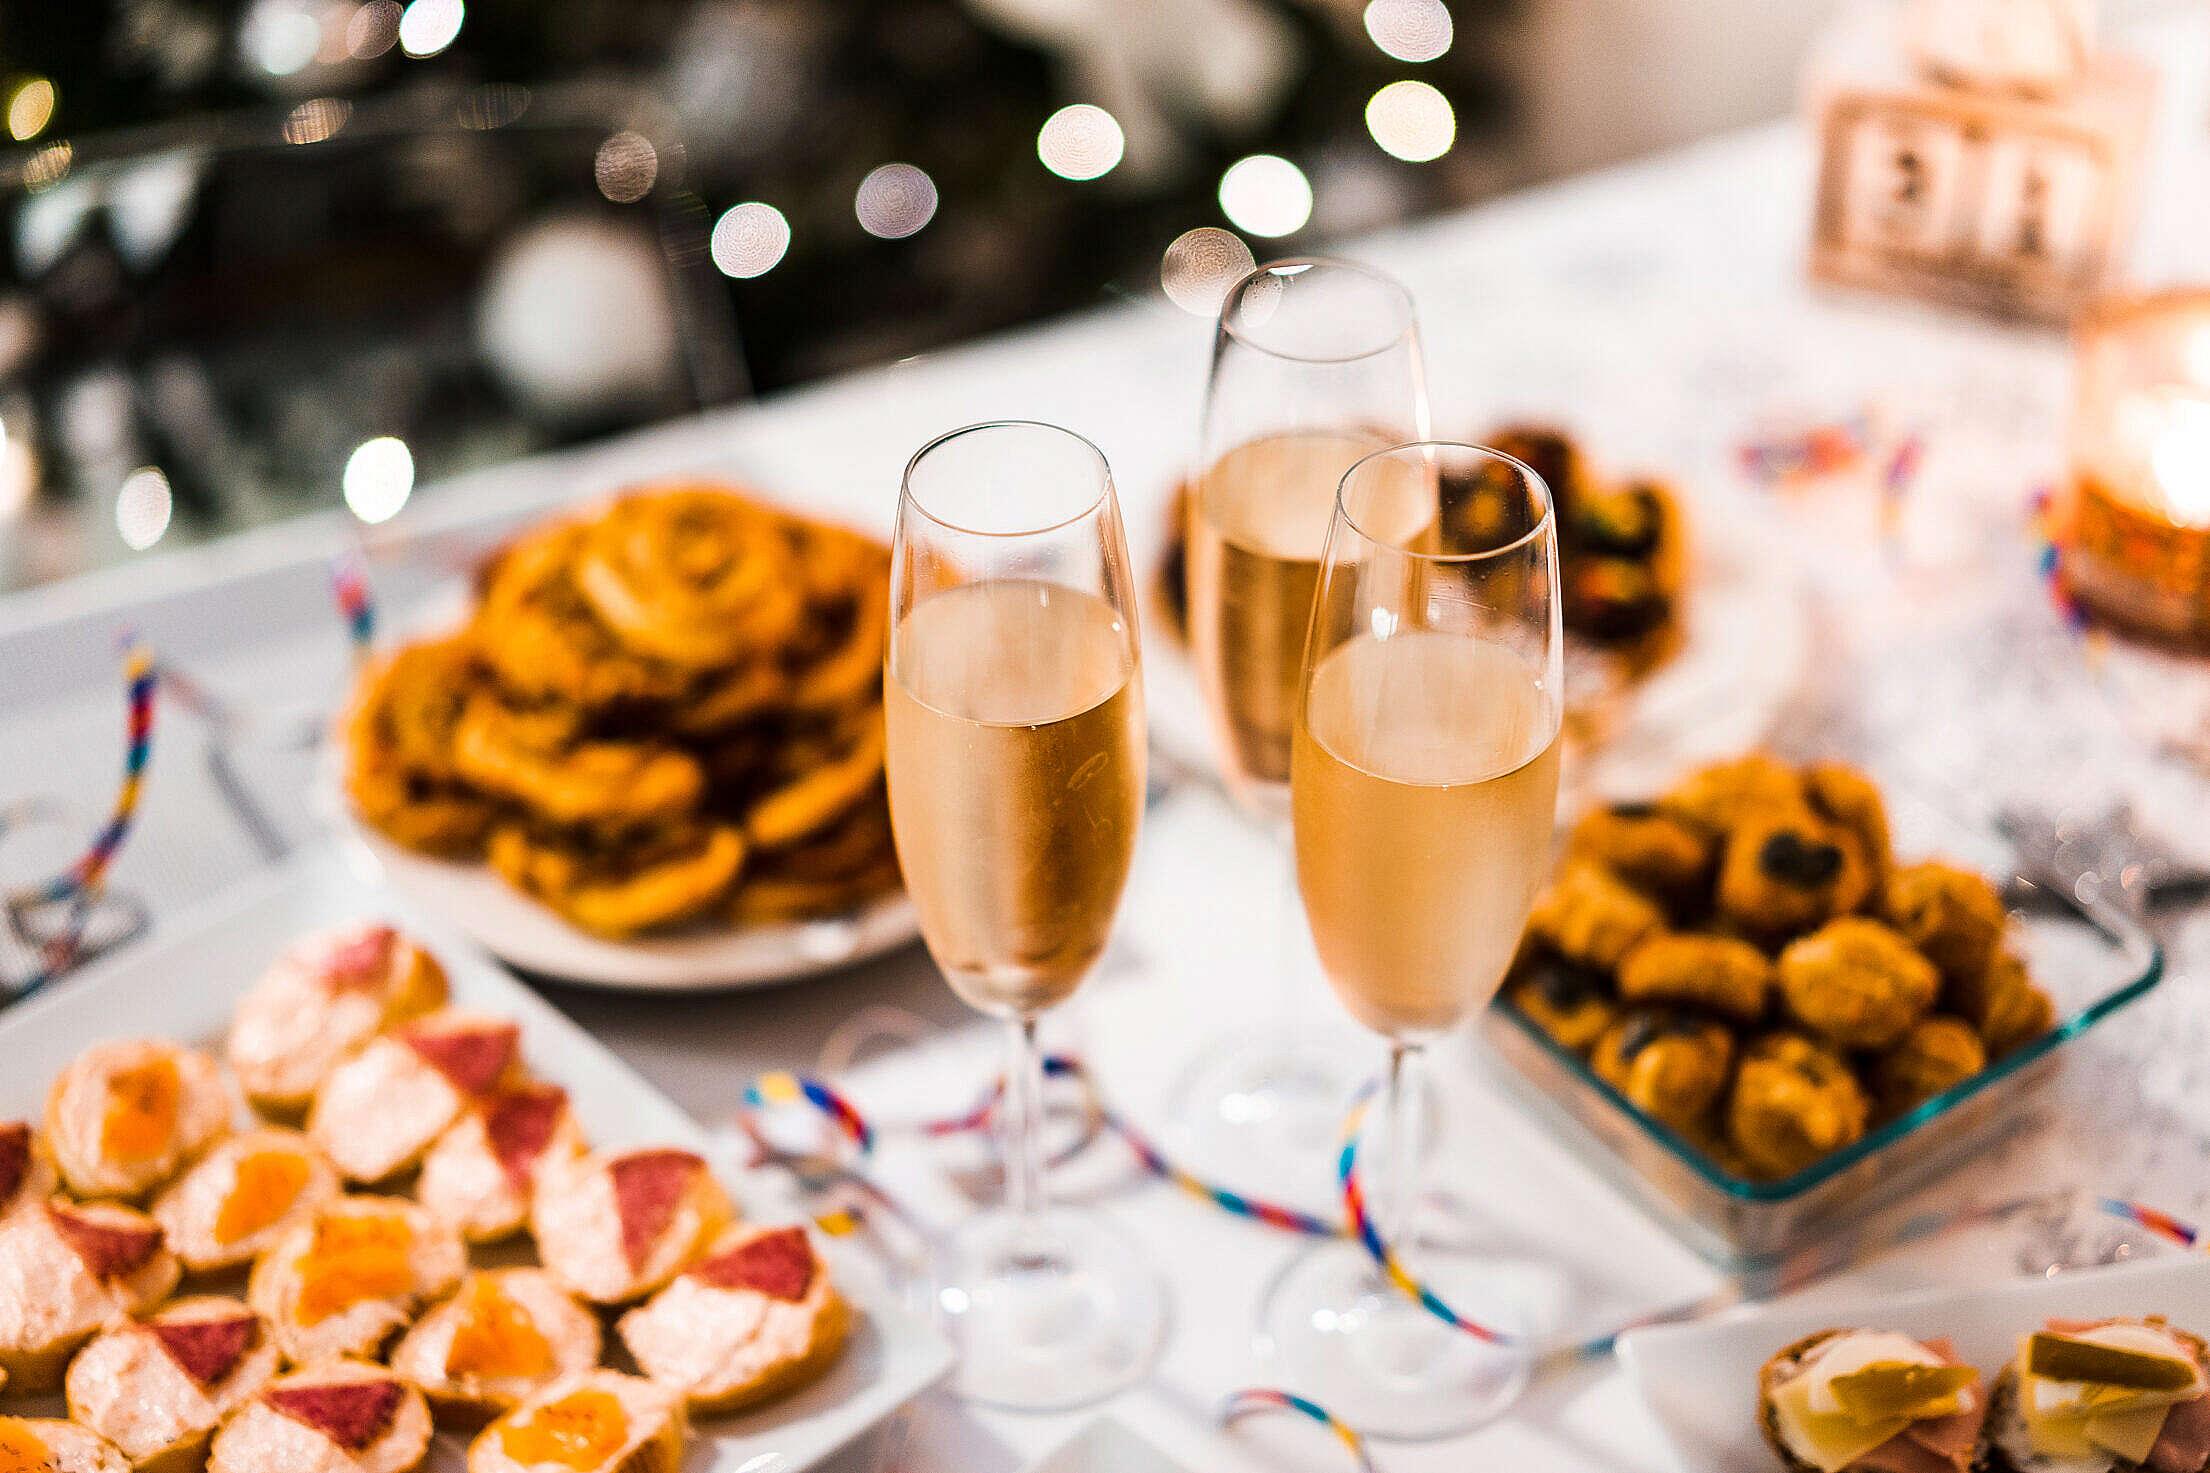 Happy New Year Party Free Stock Photo